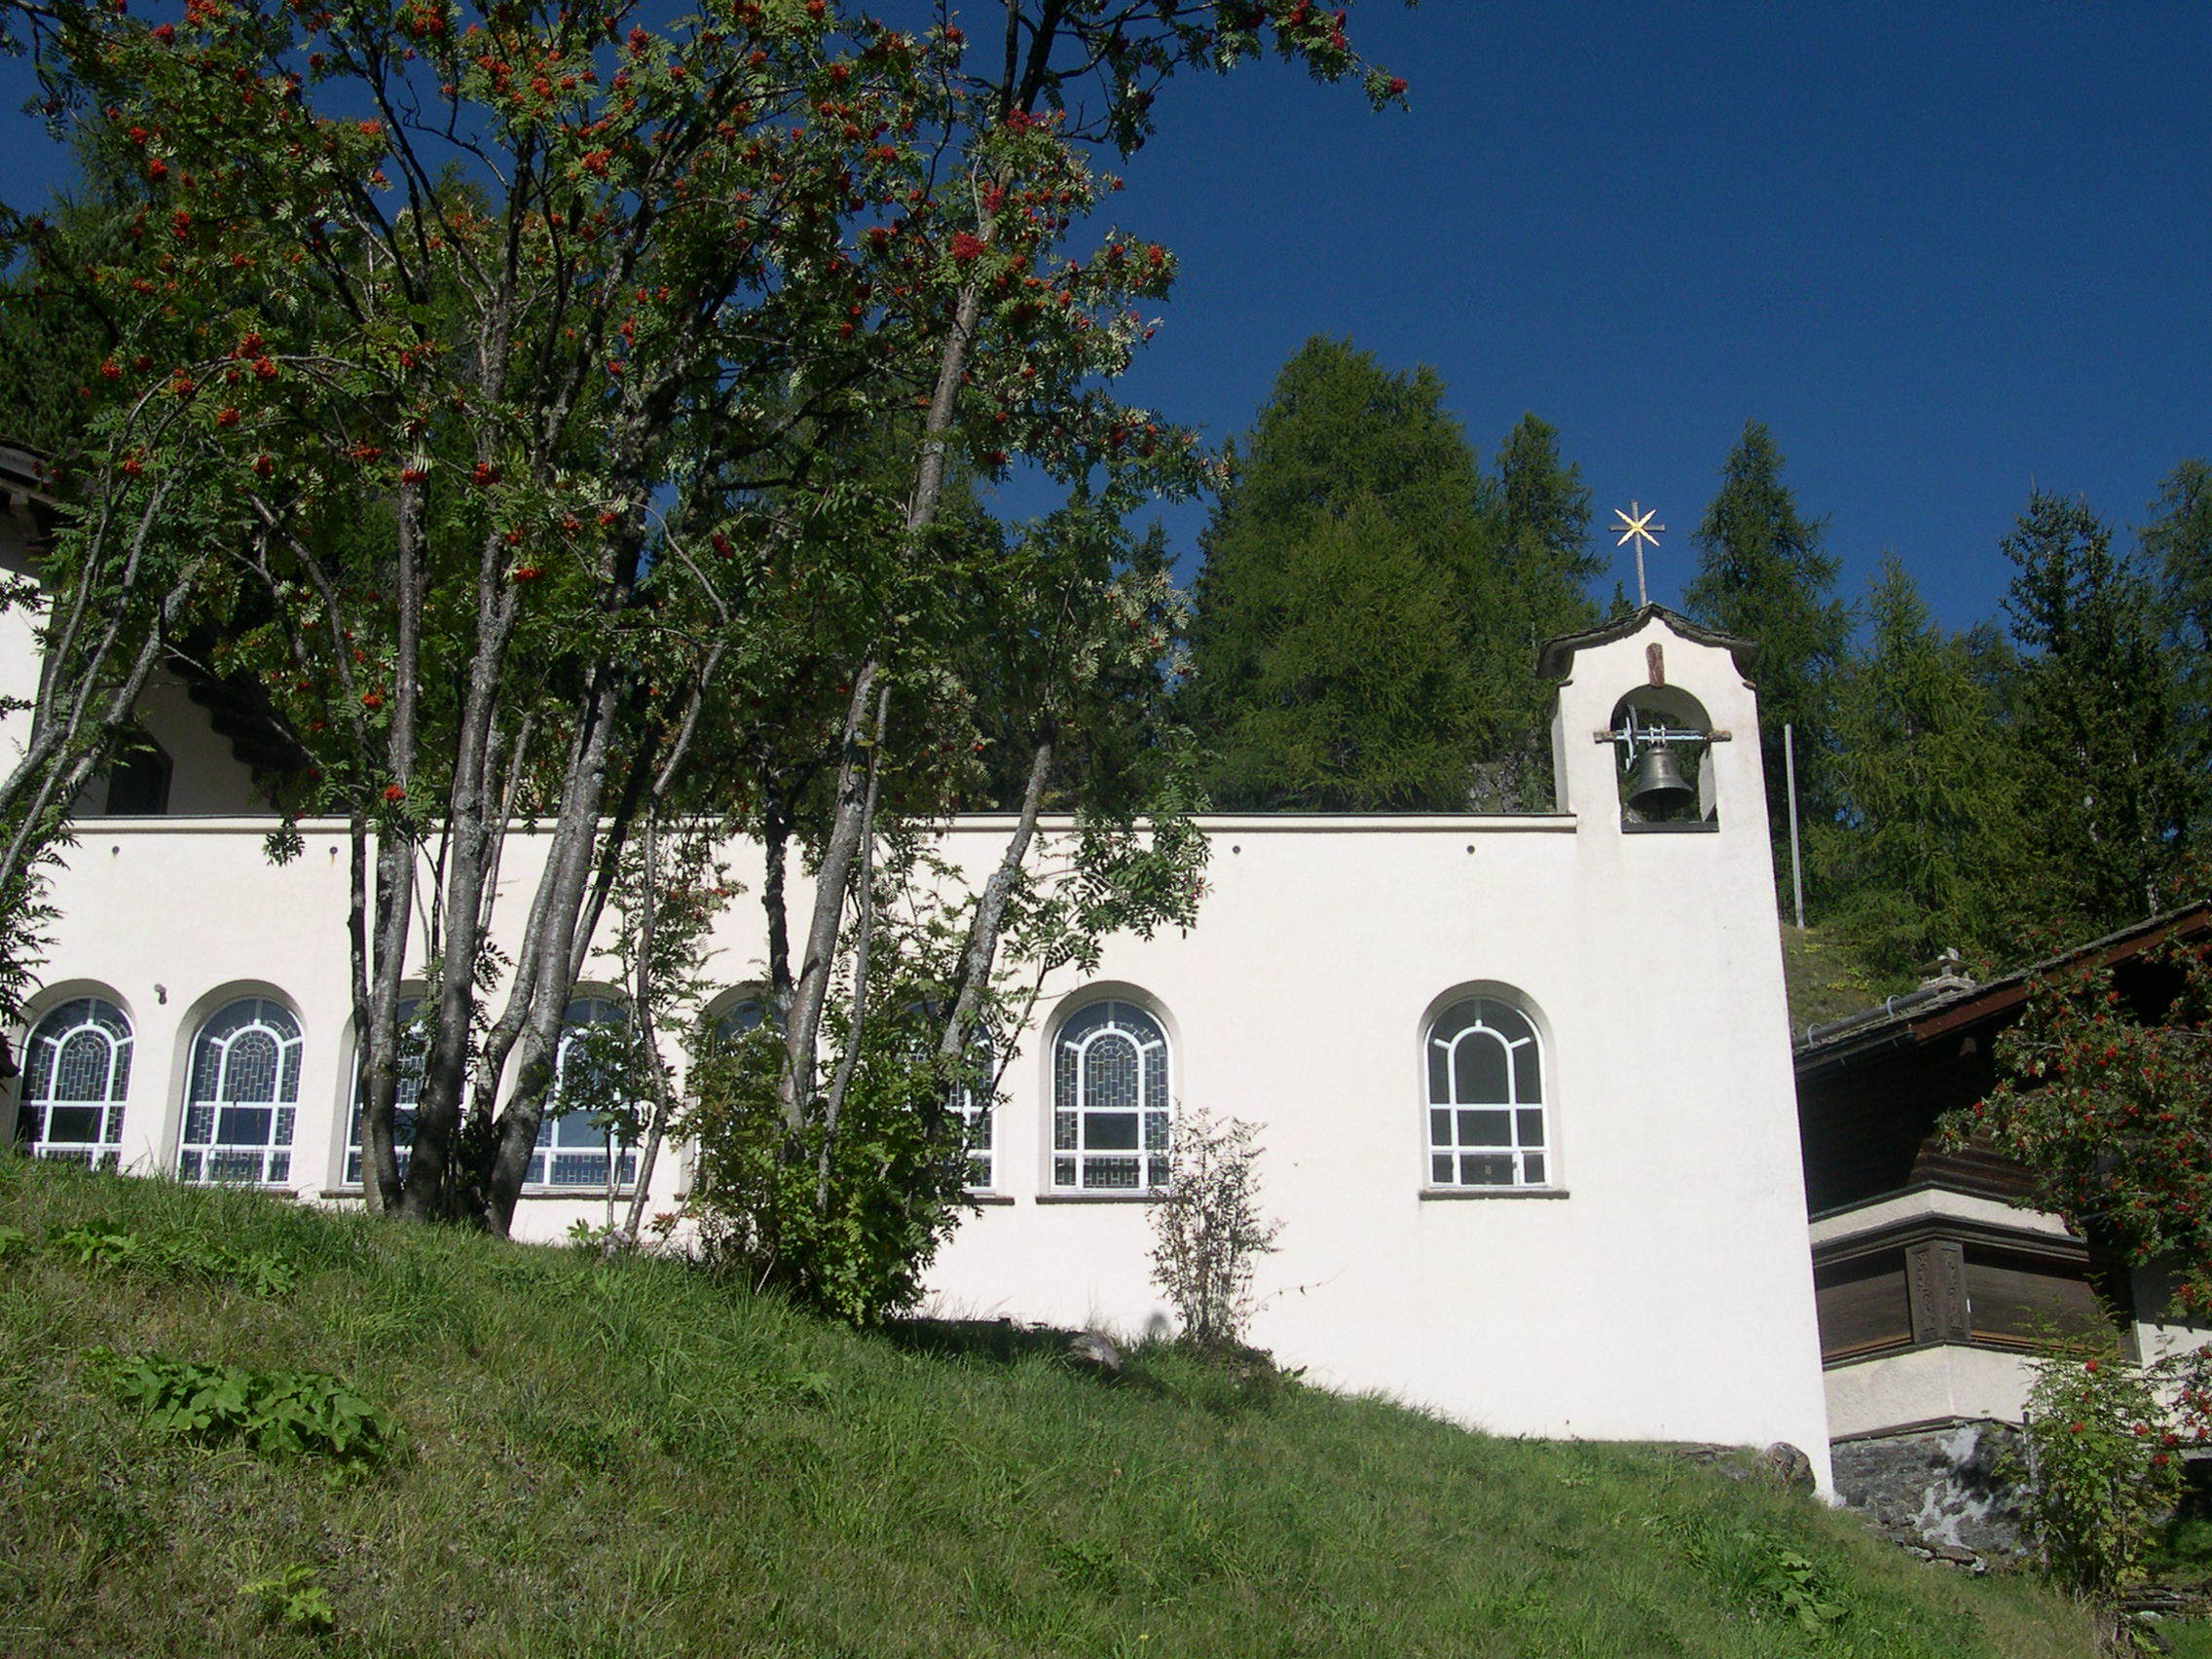 Katholische Kirche Christkönig Slide 1